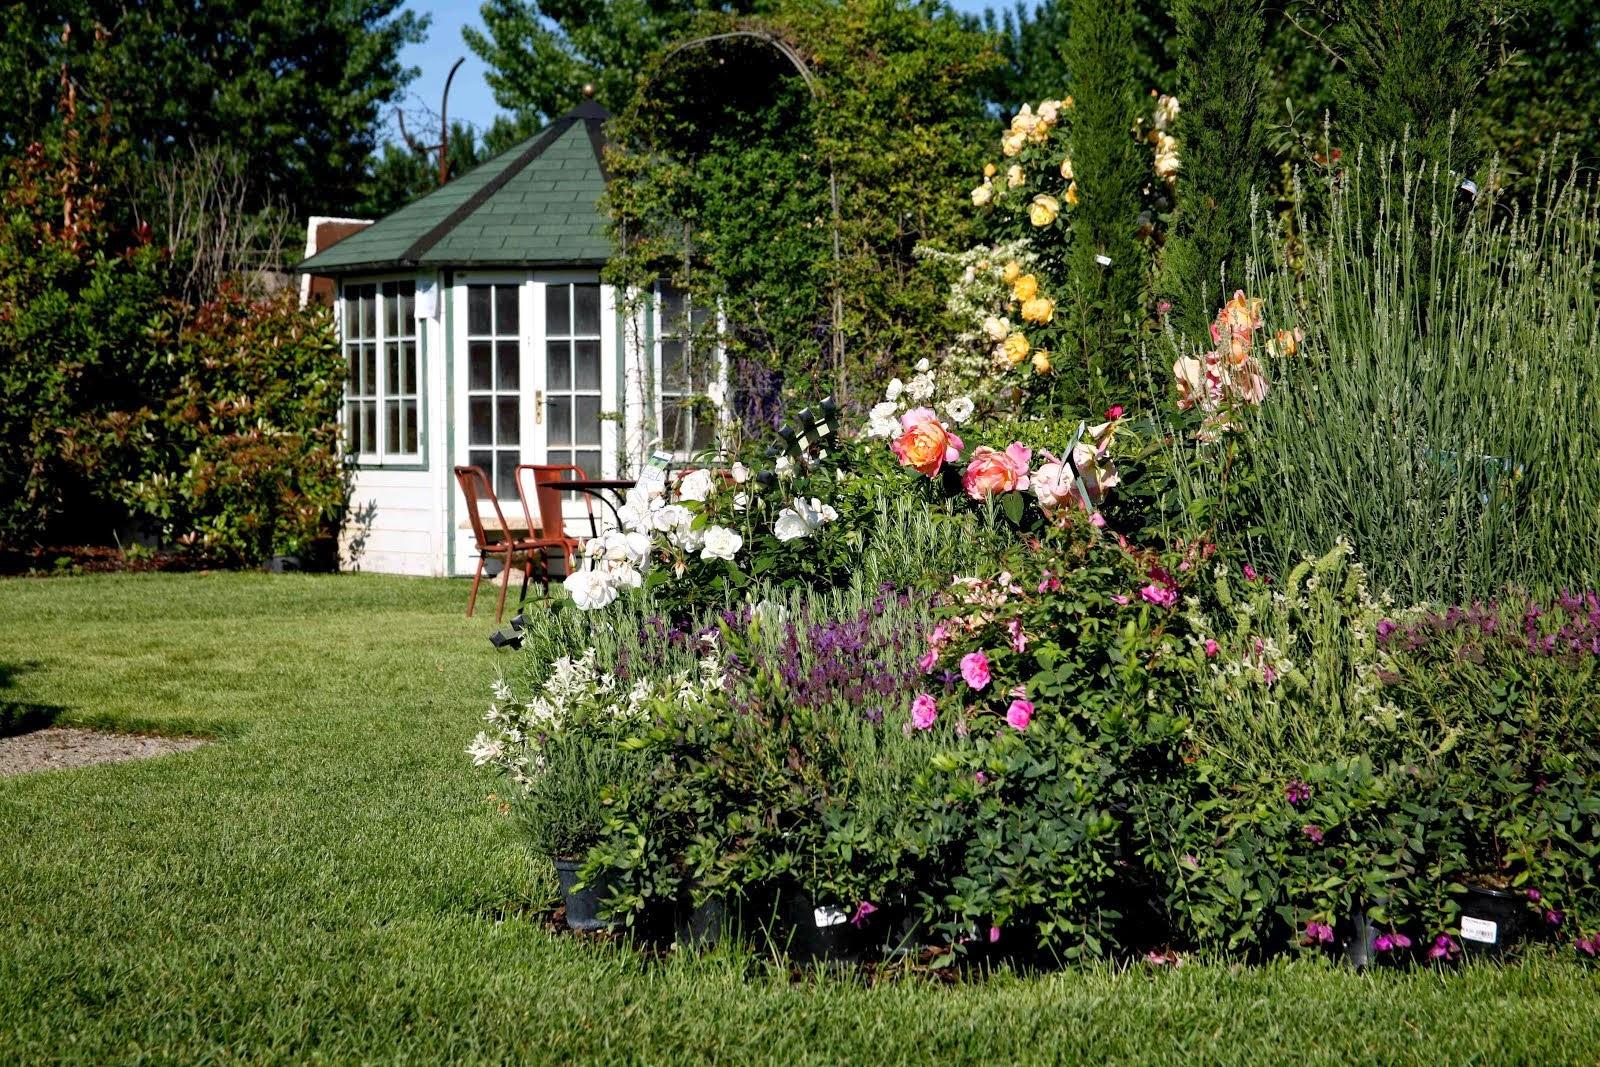 Mostre english garden mostra evento sullle erbacee for Giardini inglesi